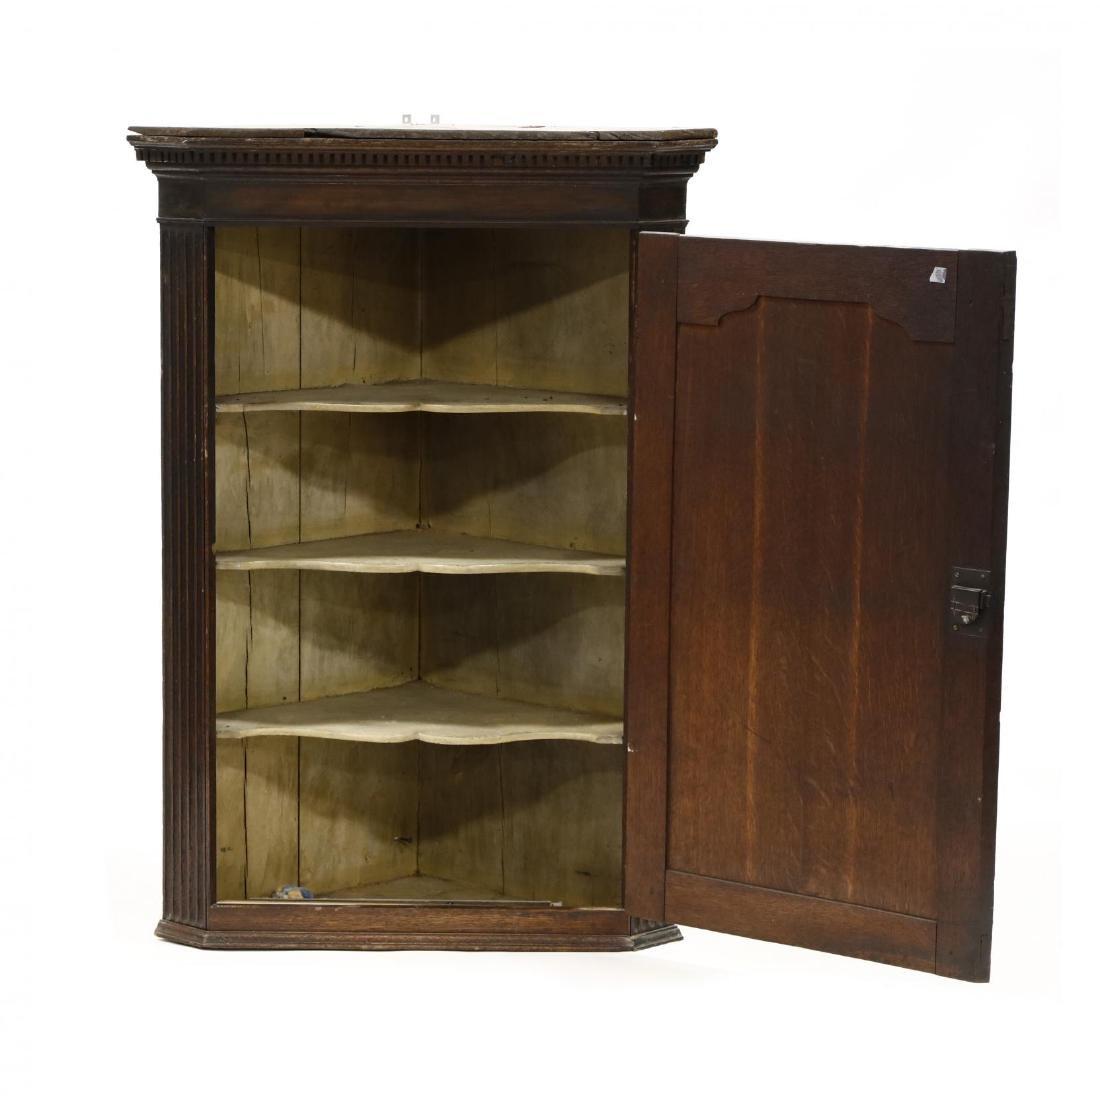 George III Carved Oak Hanging Corner Cupboard - 2